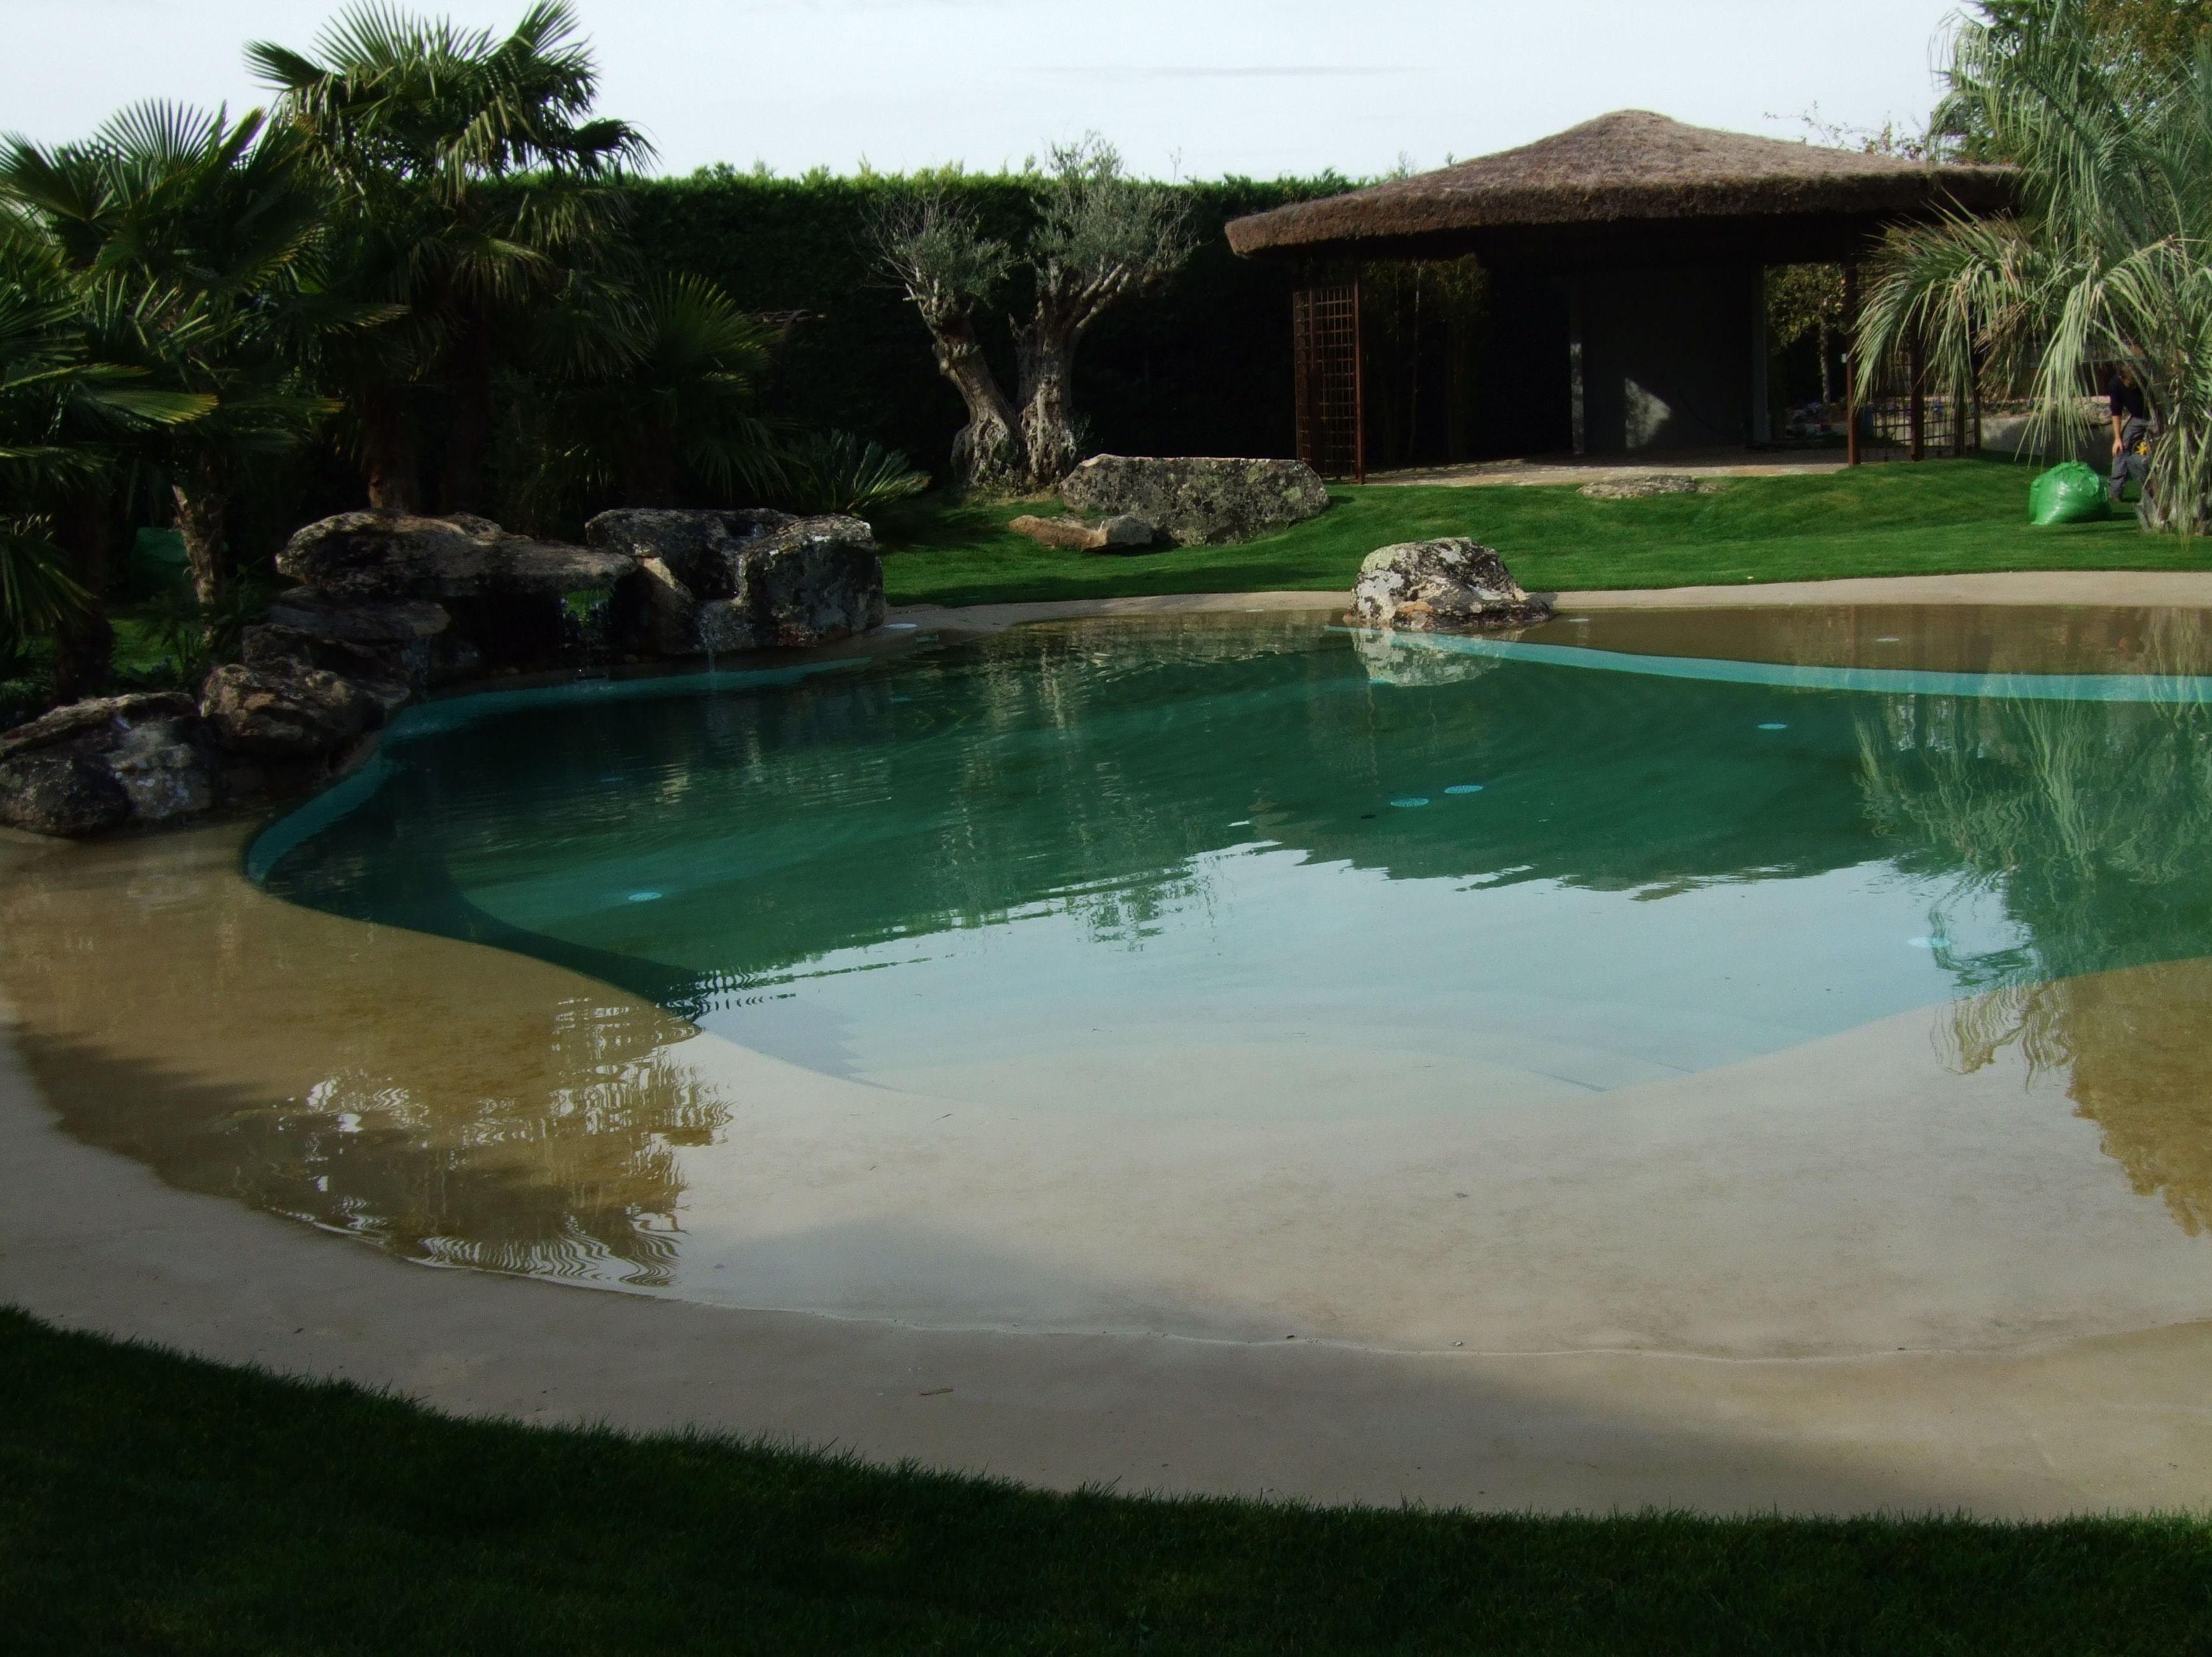 Foto 23 de Instalación de piscinas en Leganés | Lallana Pol